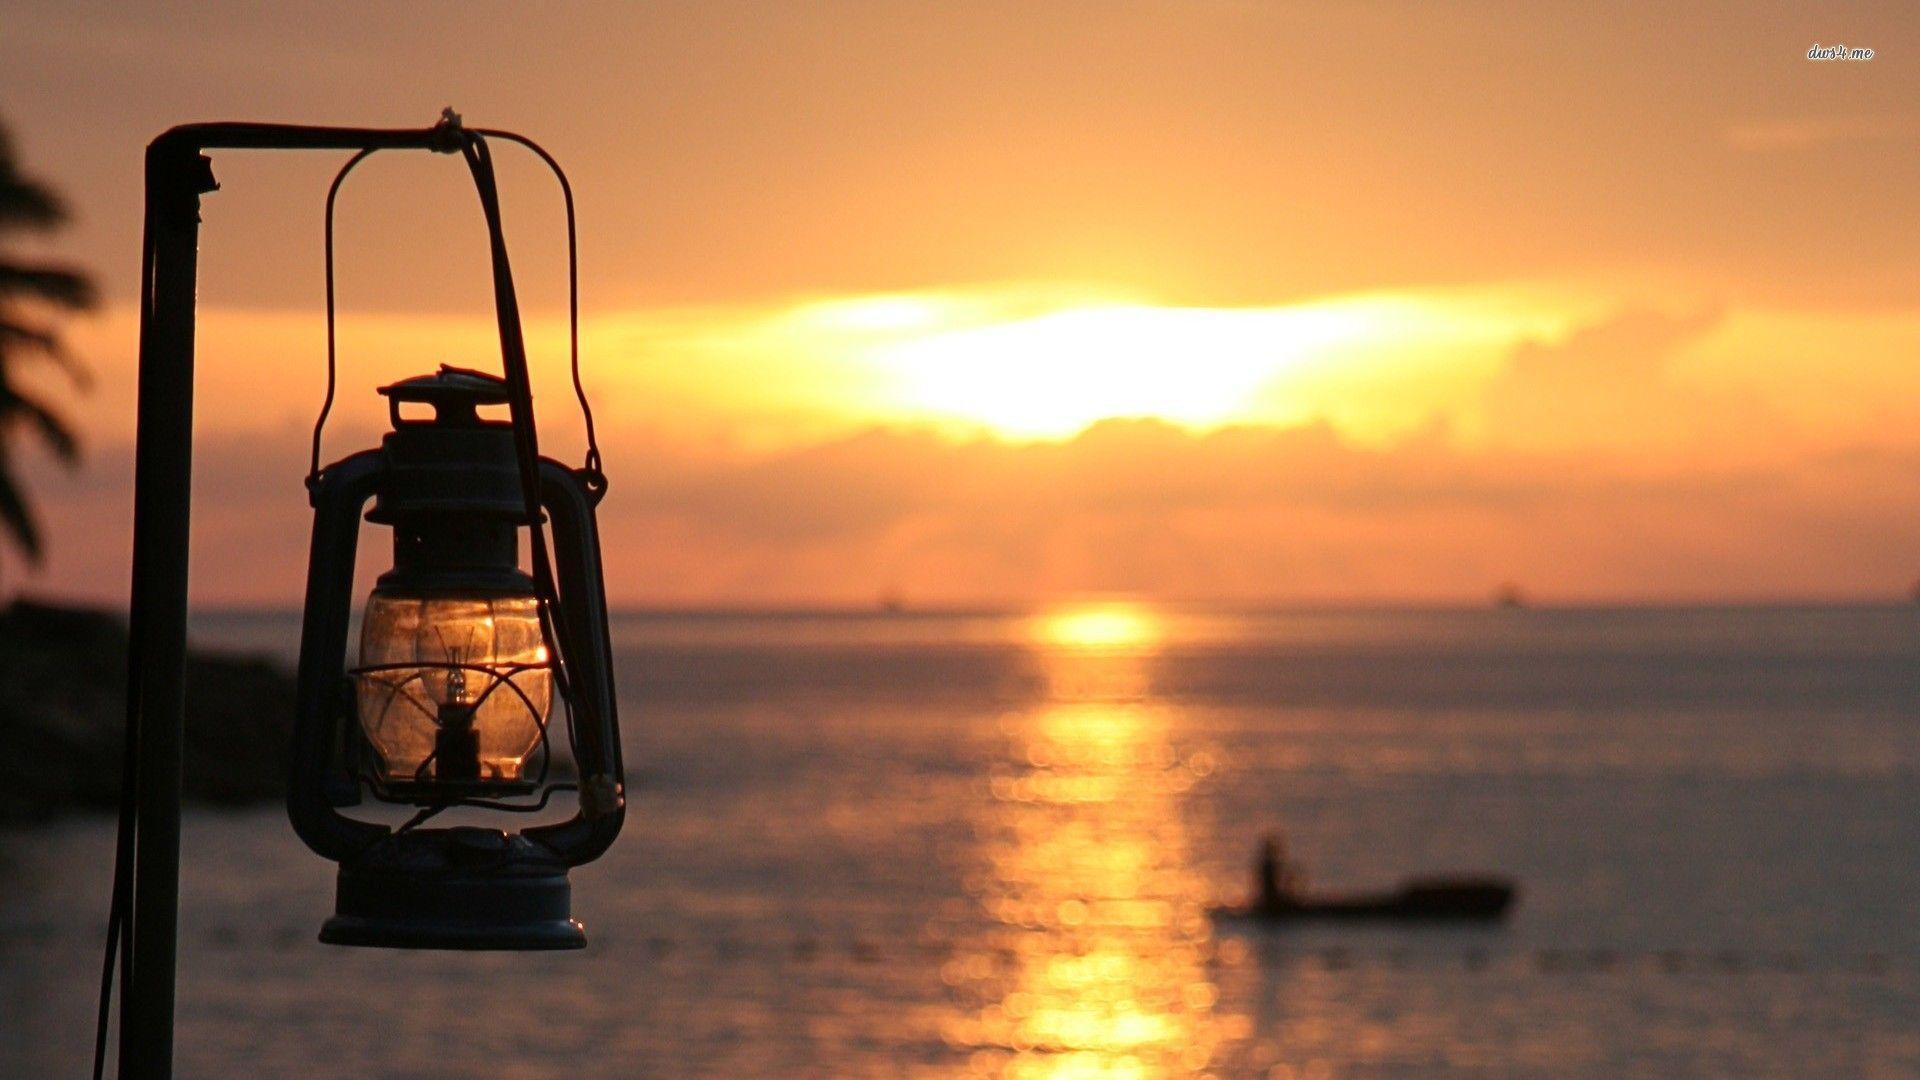 Oil lamp on Panaji beach, India wallpaper - Beach wallpapers - #